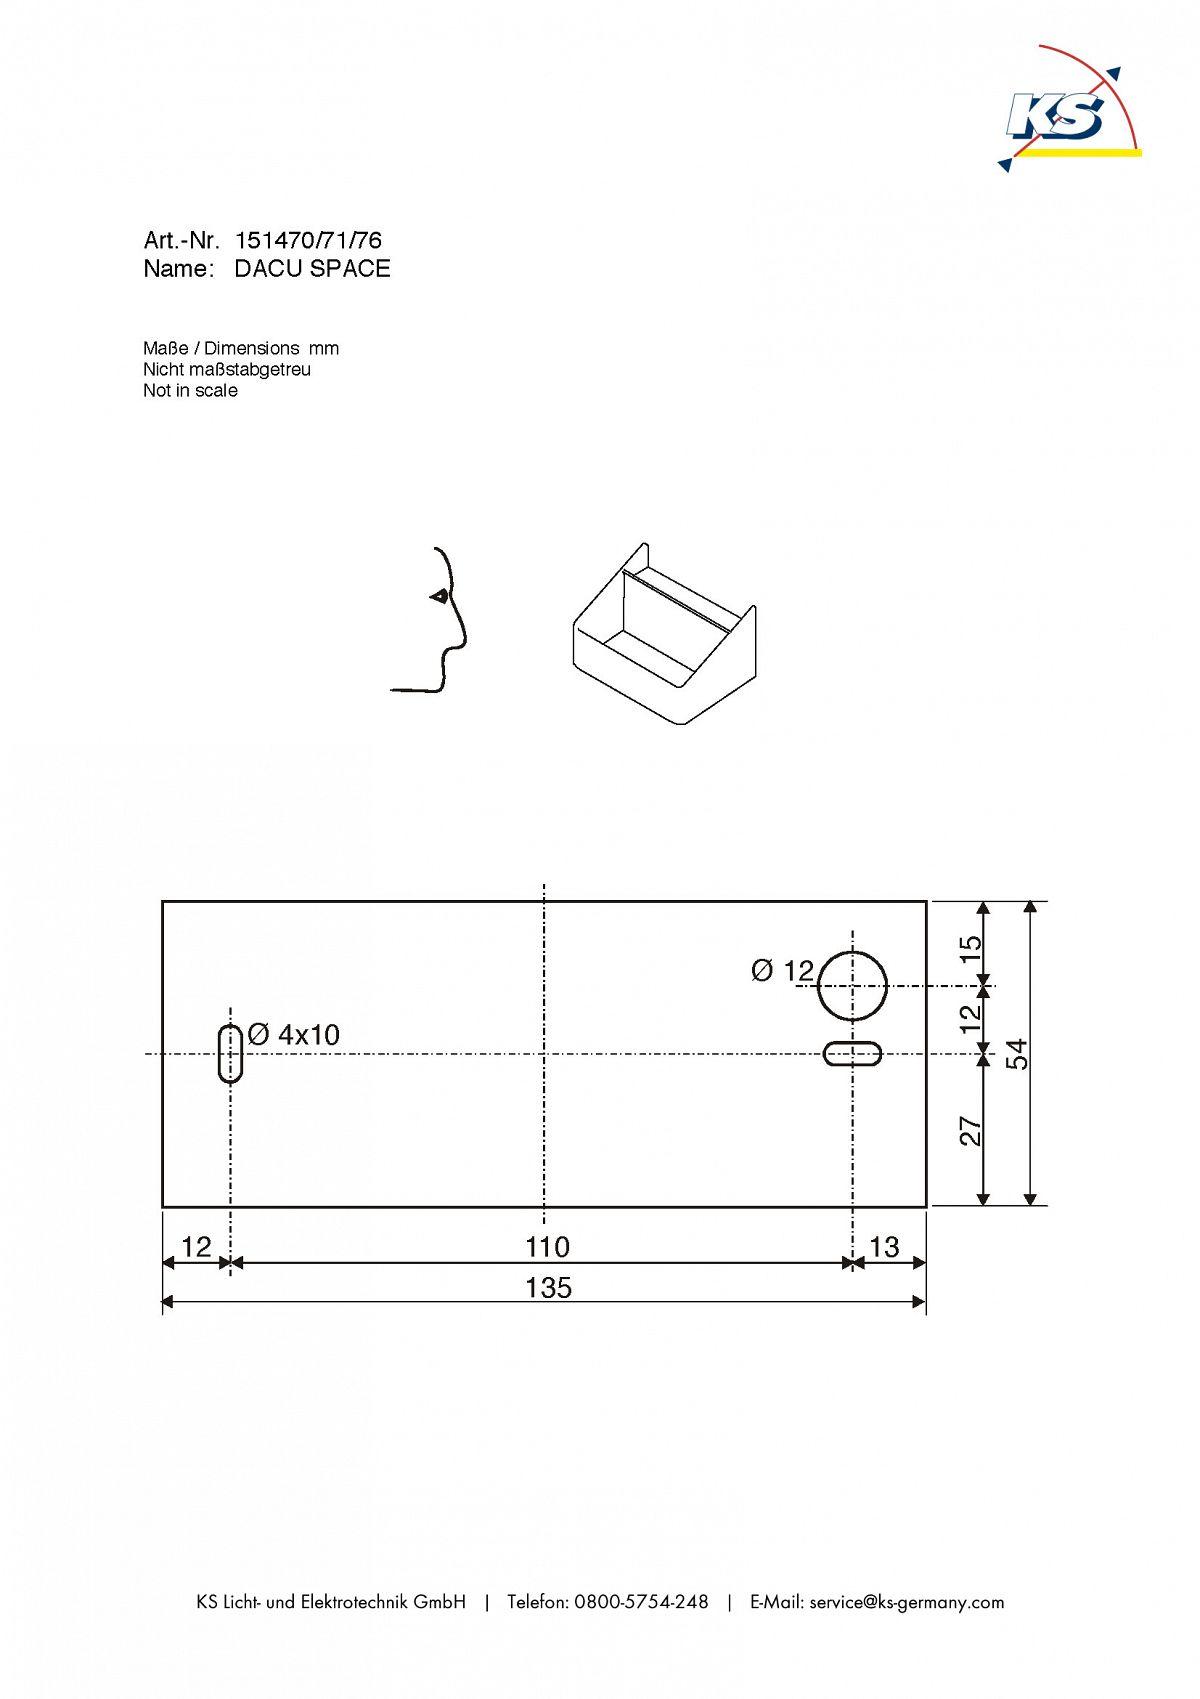 wandleuchte dacu space mit warmweissen led geh use aluminium wei ks licht onlineshop. Black Bedroom Furniture Sets. Home Design Ideas